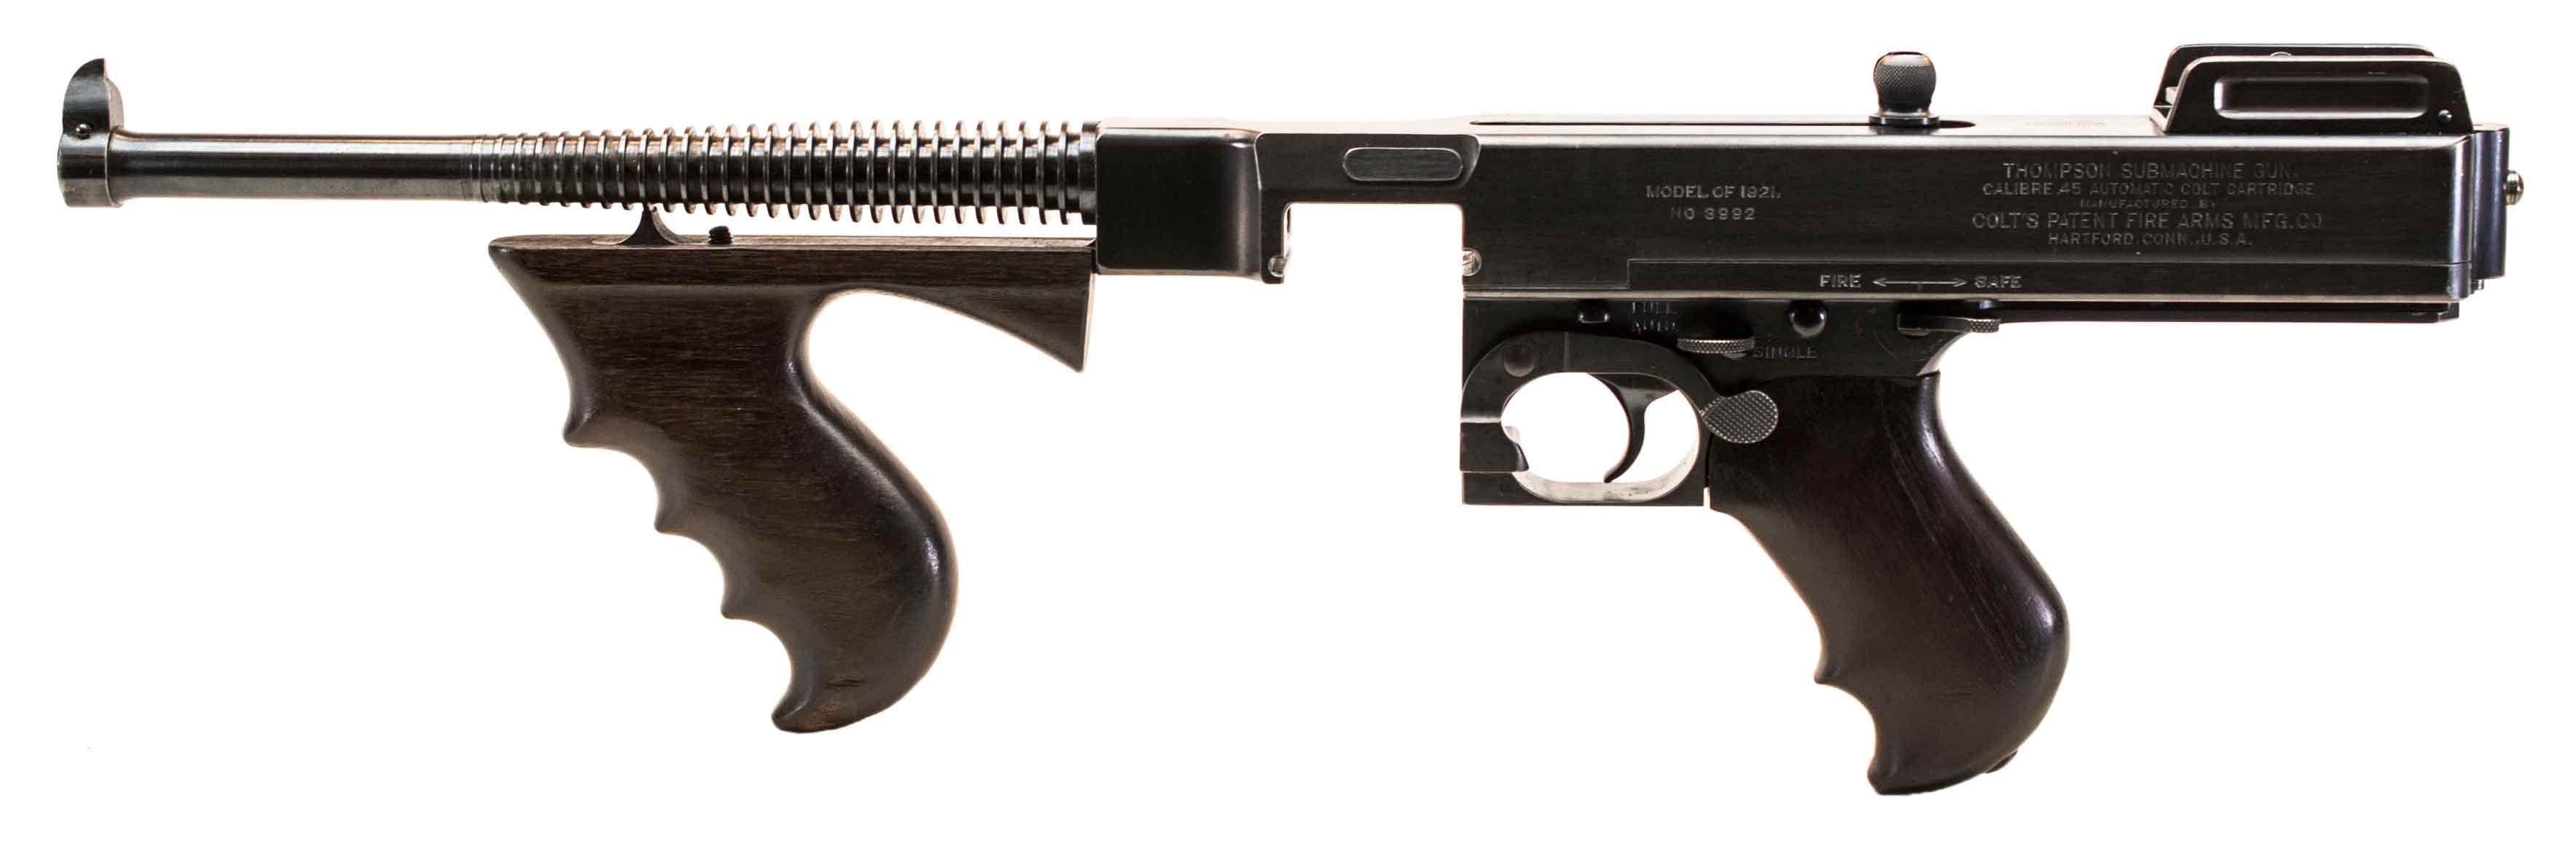 Auto Ordnance Thompson M1